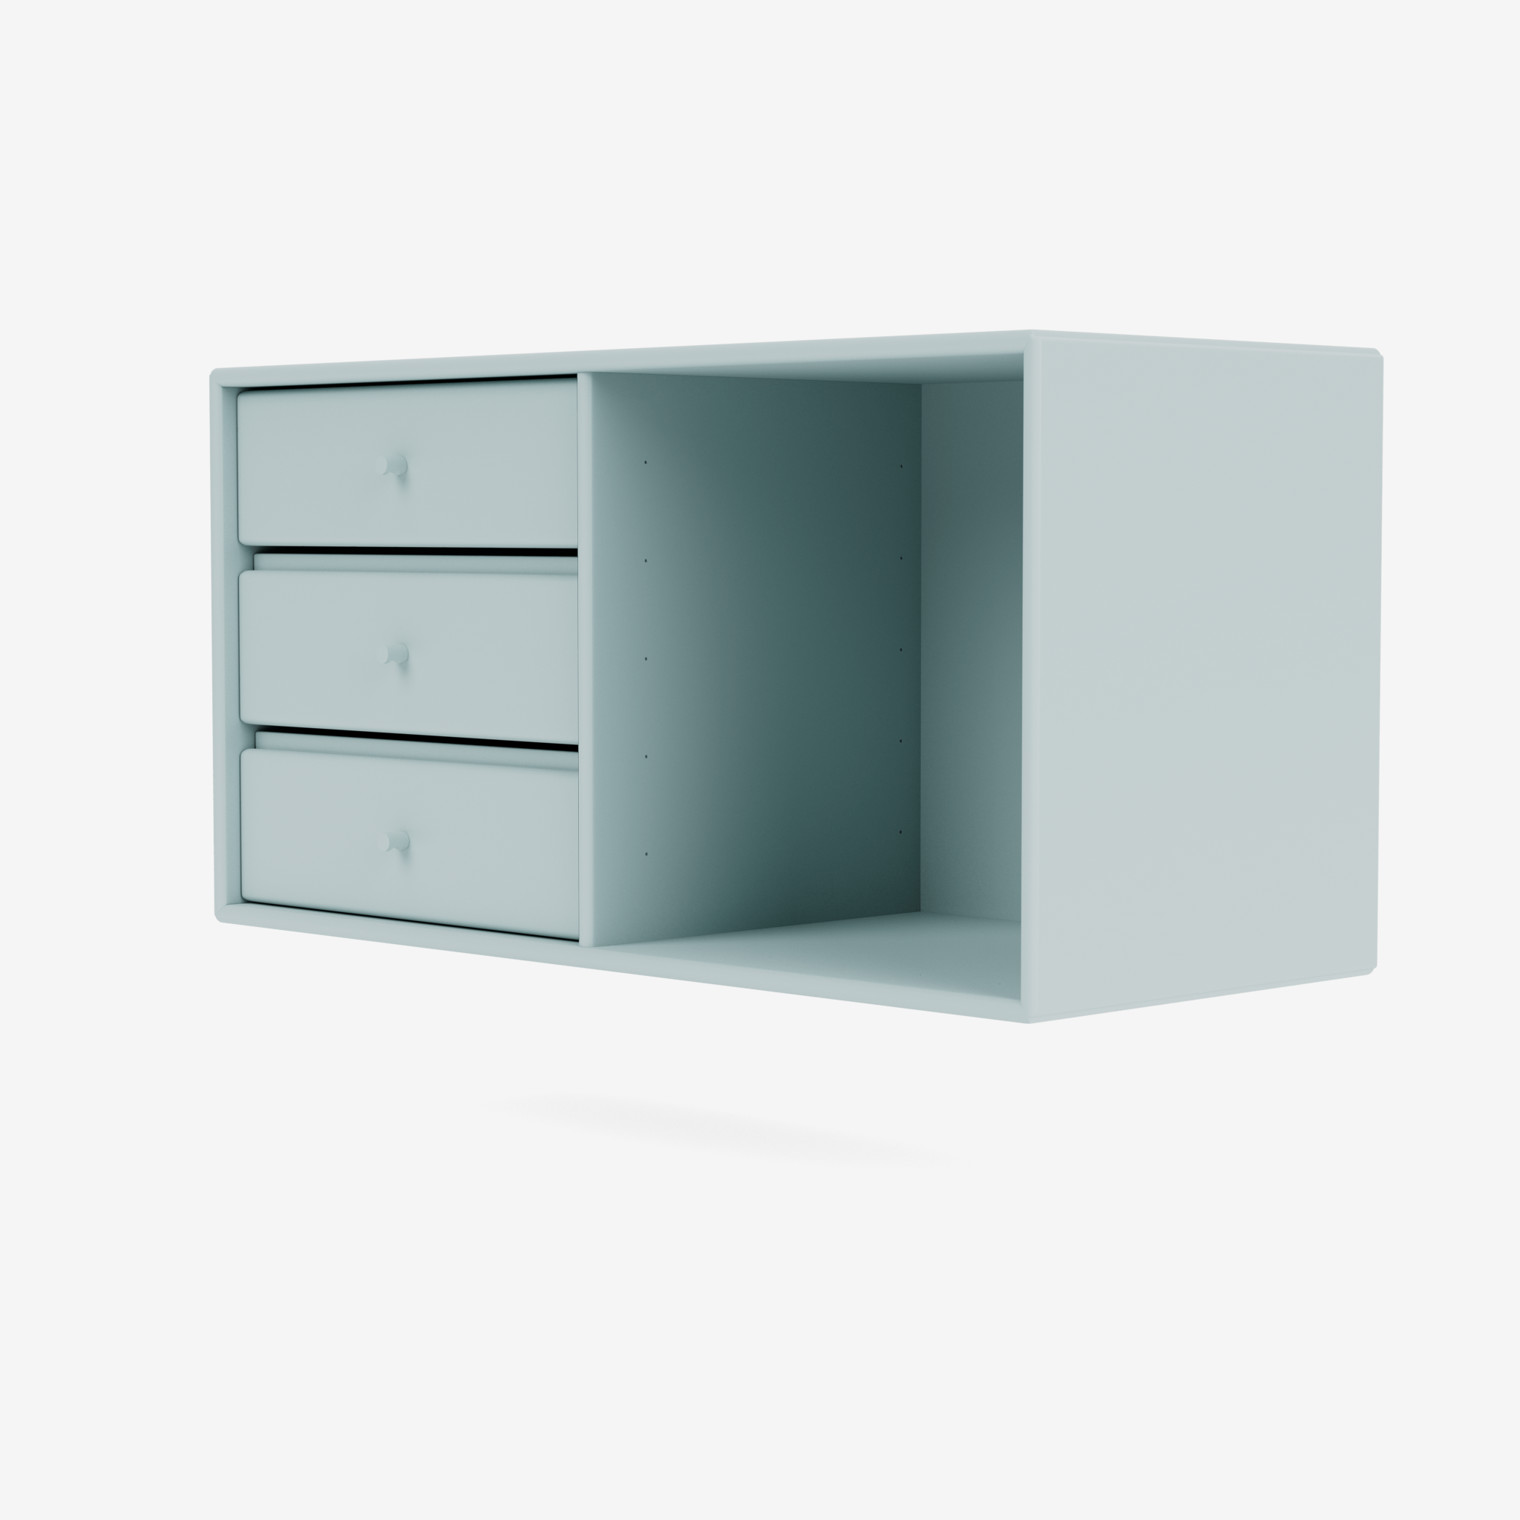 Shelf 6223